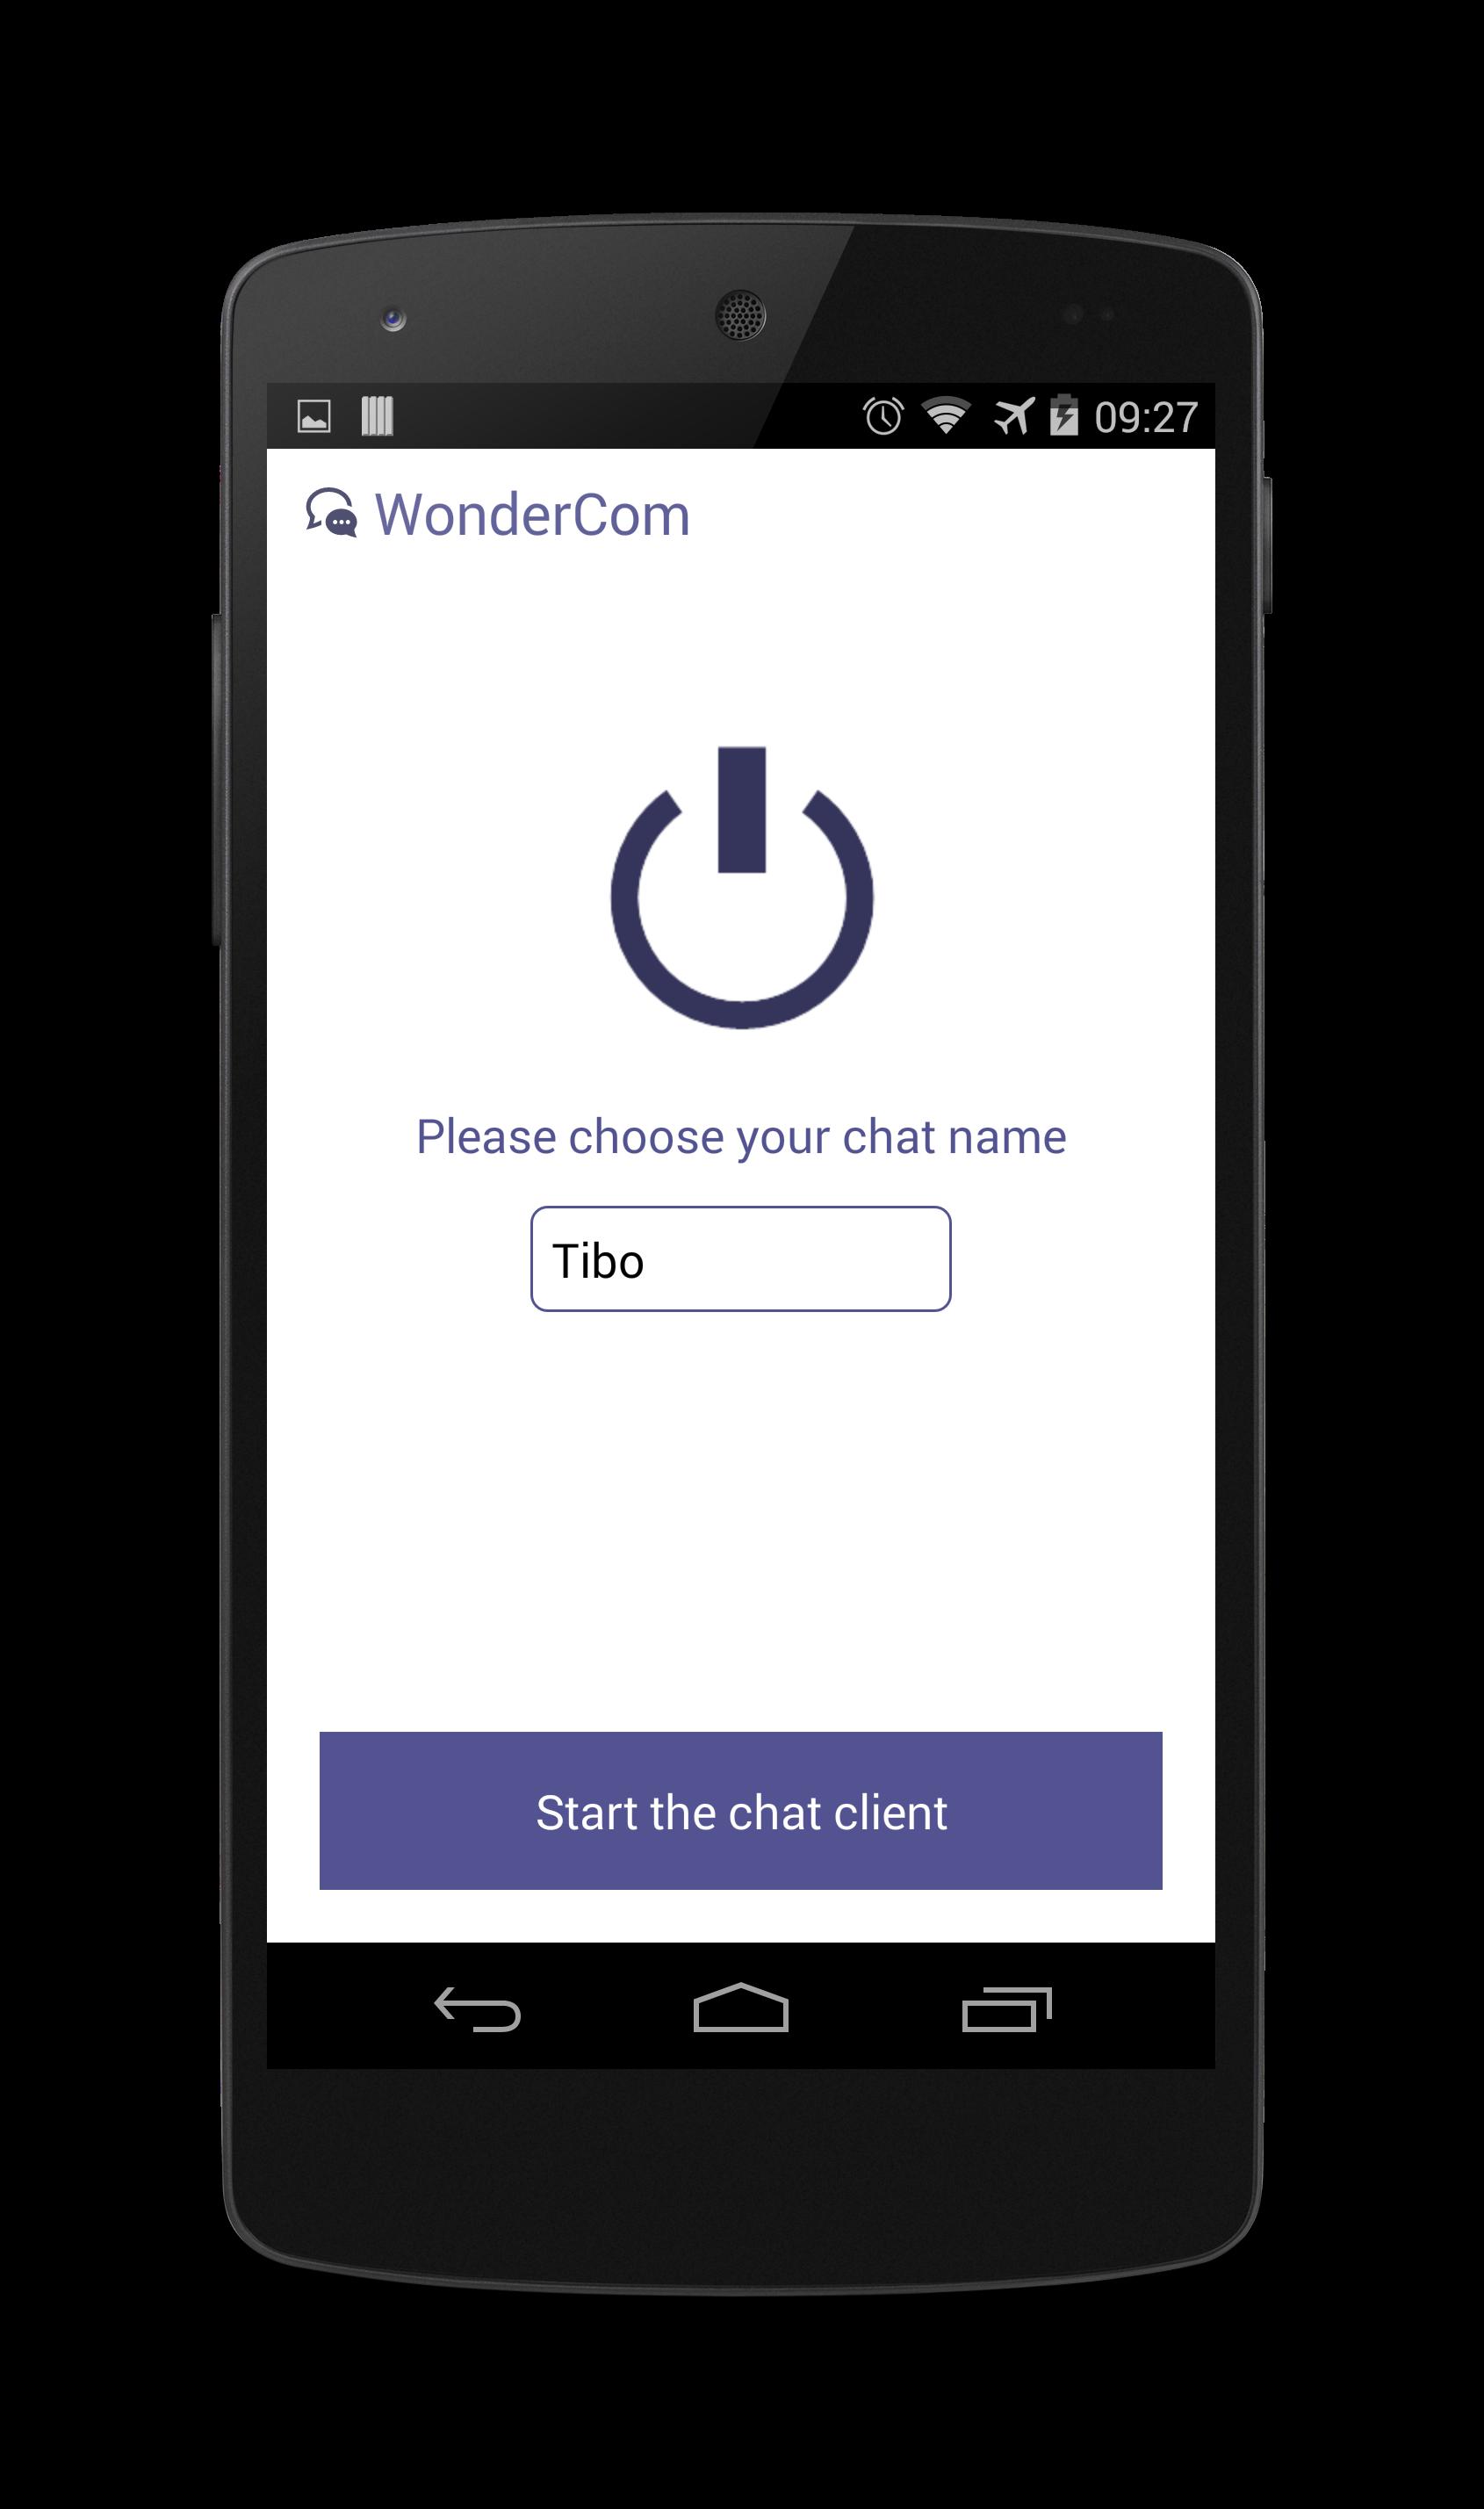 GitHub - rubeus90/WonderCom: Android chat application using Wifi Direct